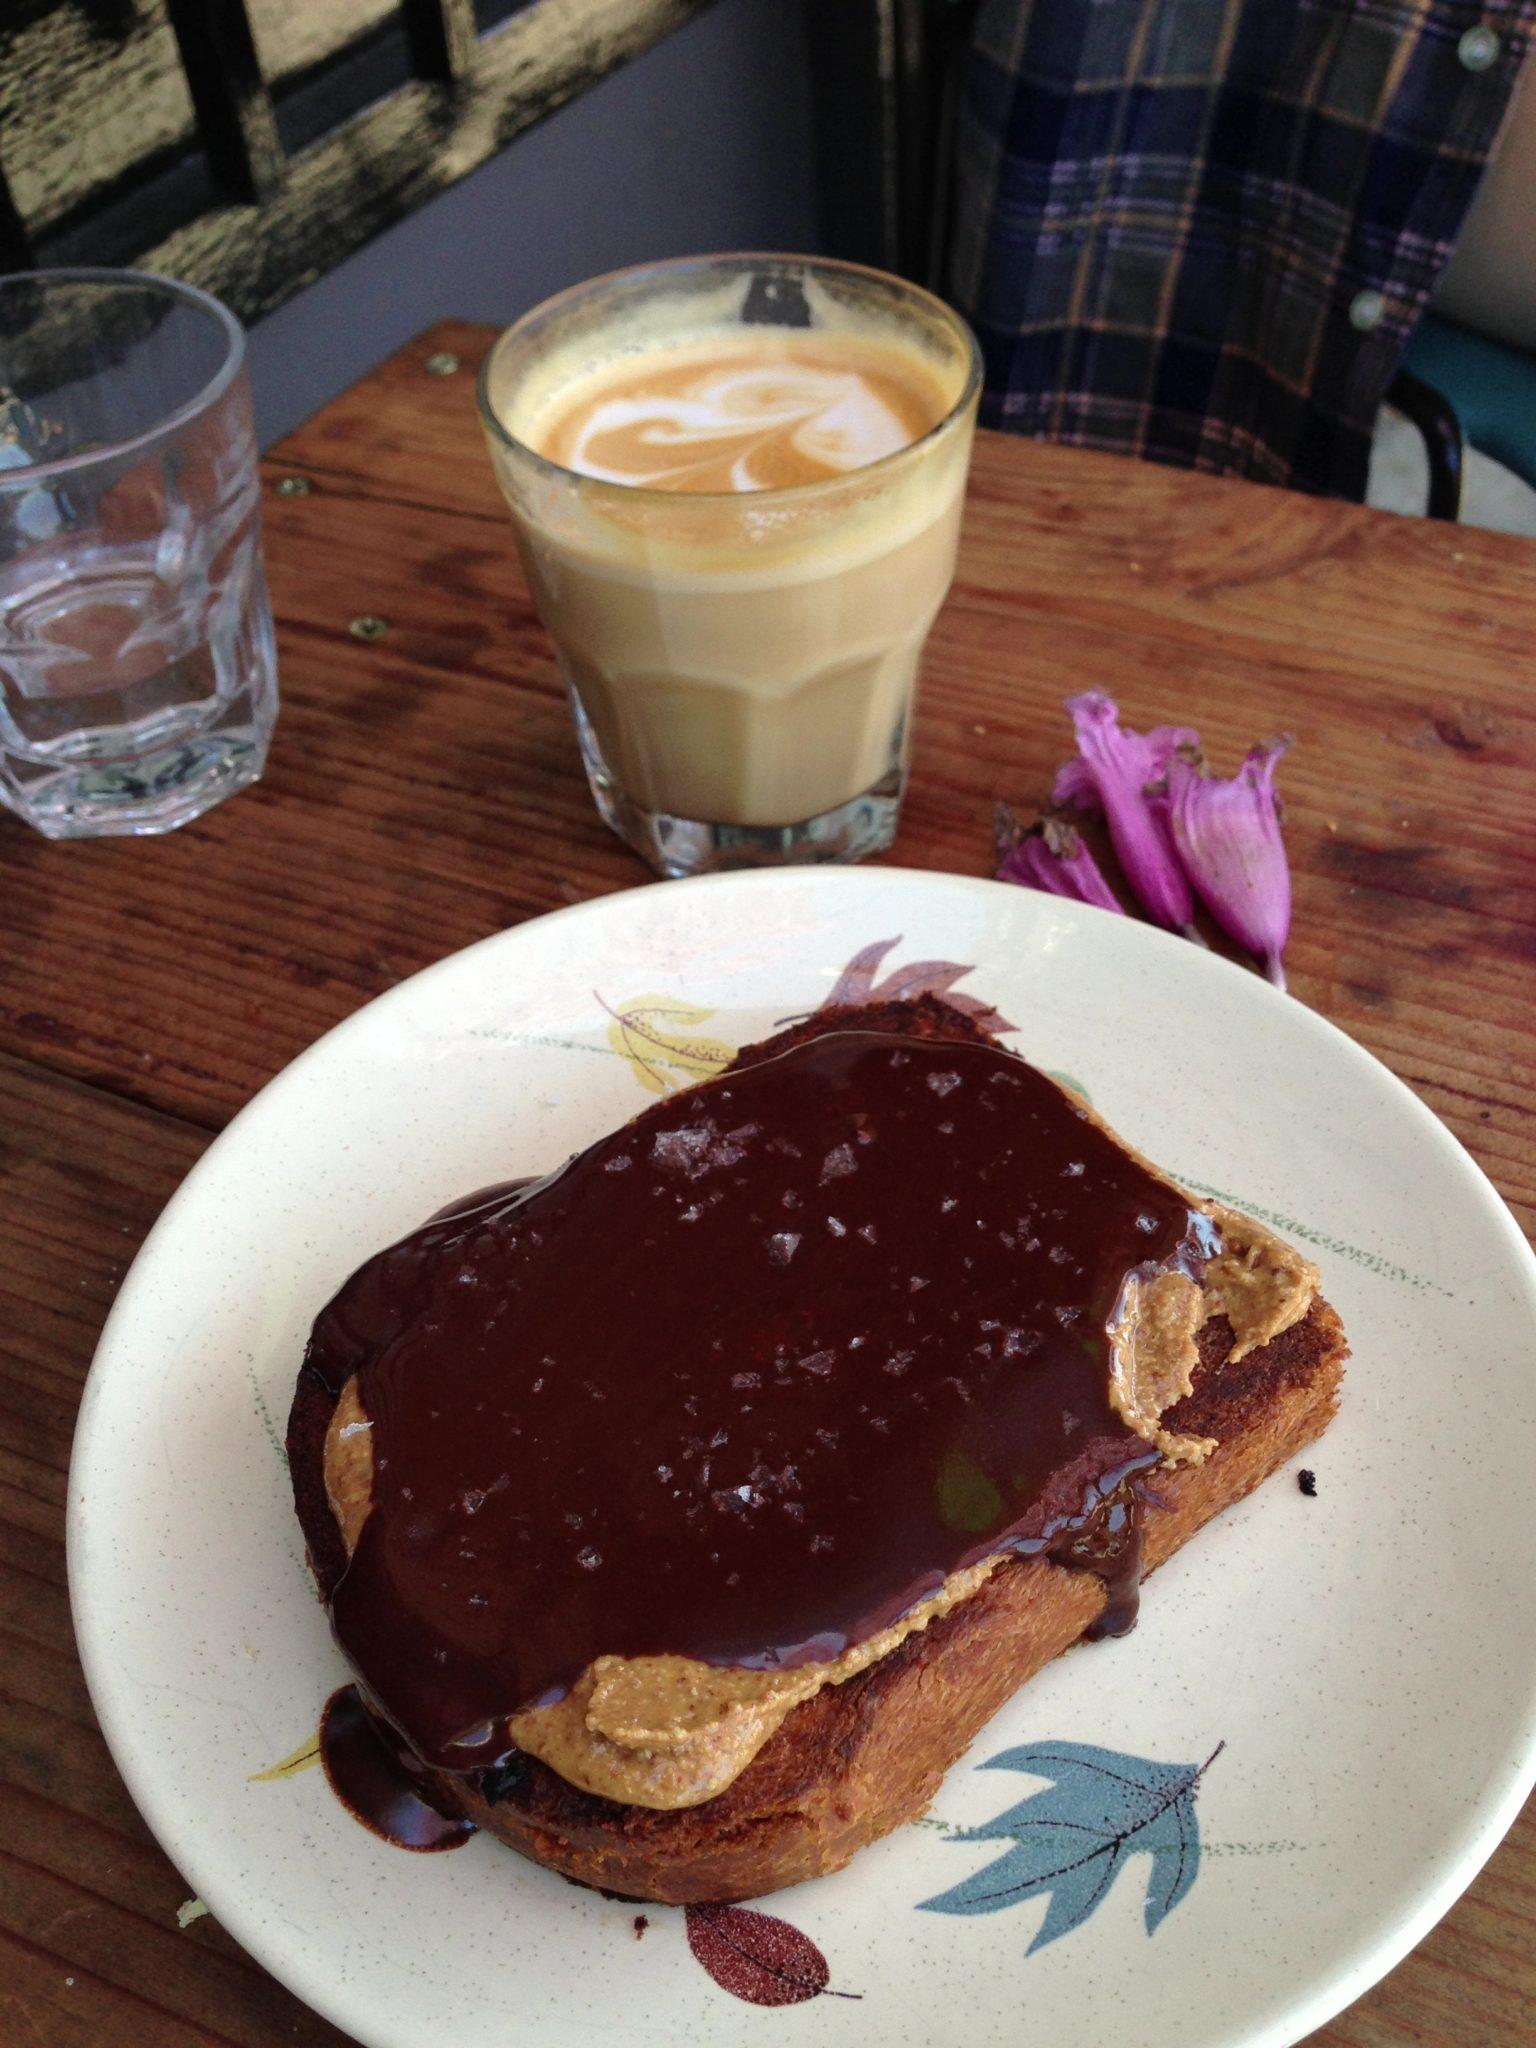 At Sqirl - Warm brioche toast, almond butter, guittard chocolate sauce, Fleur de sell ... Just exquisite